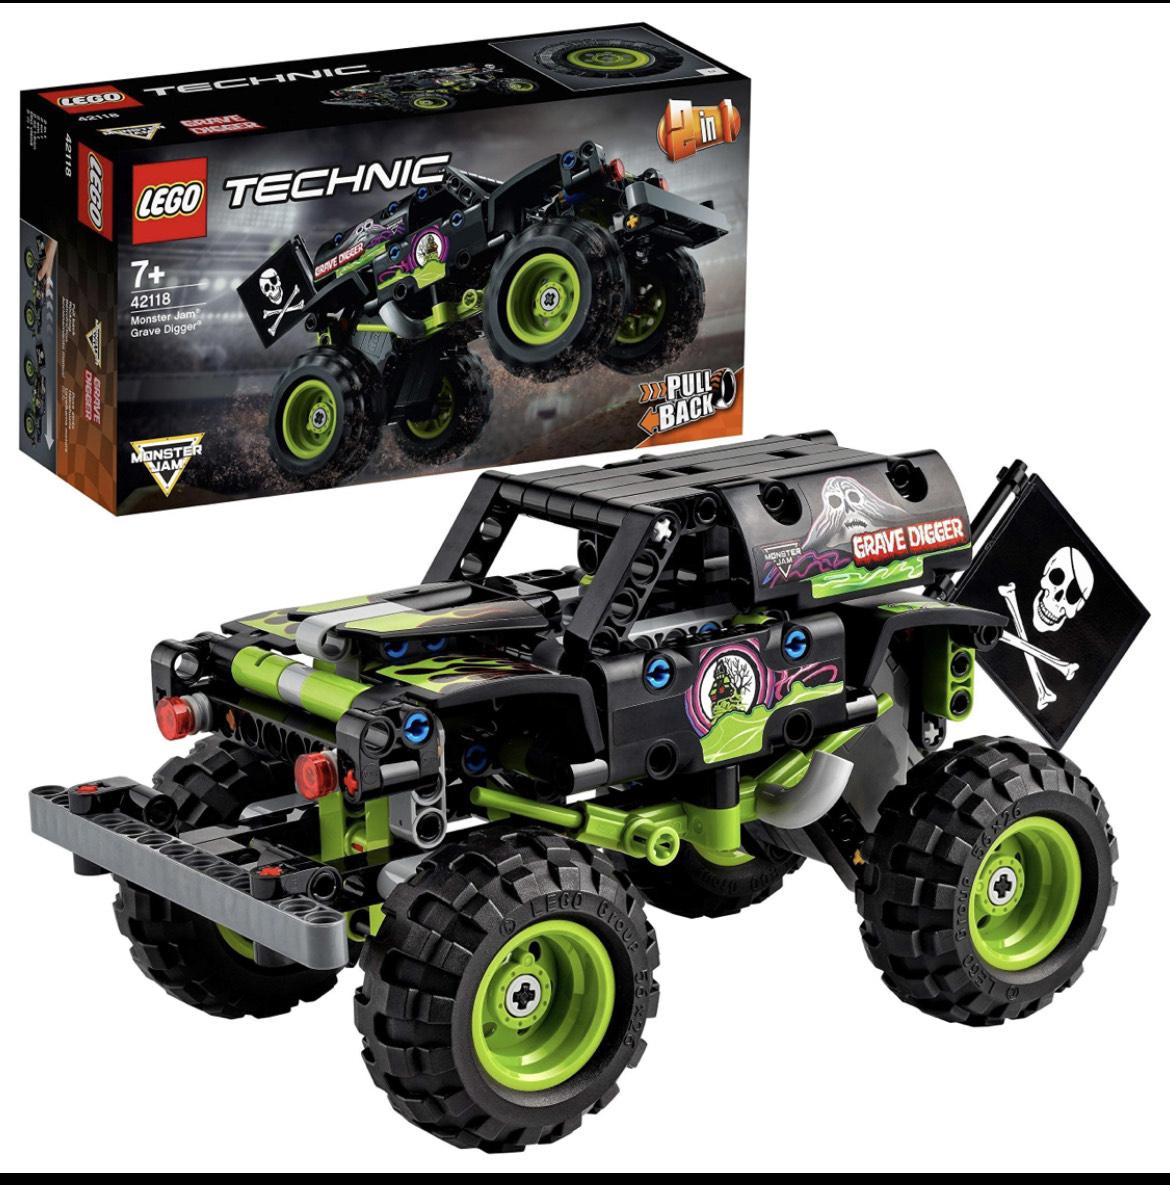 [Amazon] LEGO Technic 42118 - 2 in 1 Monster Jam Grave Digger